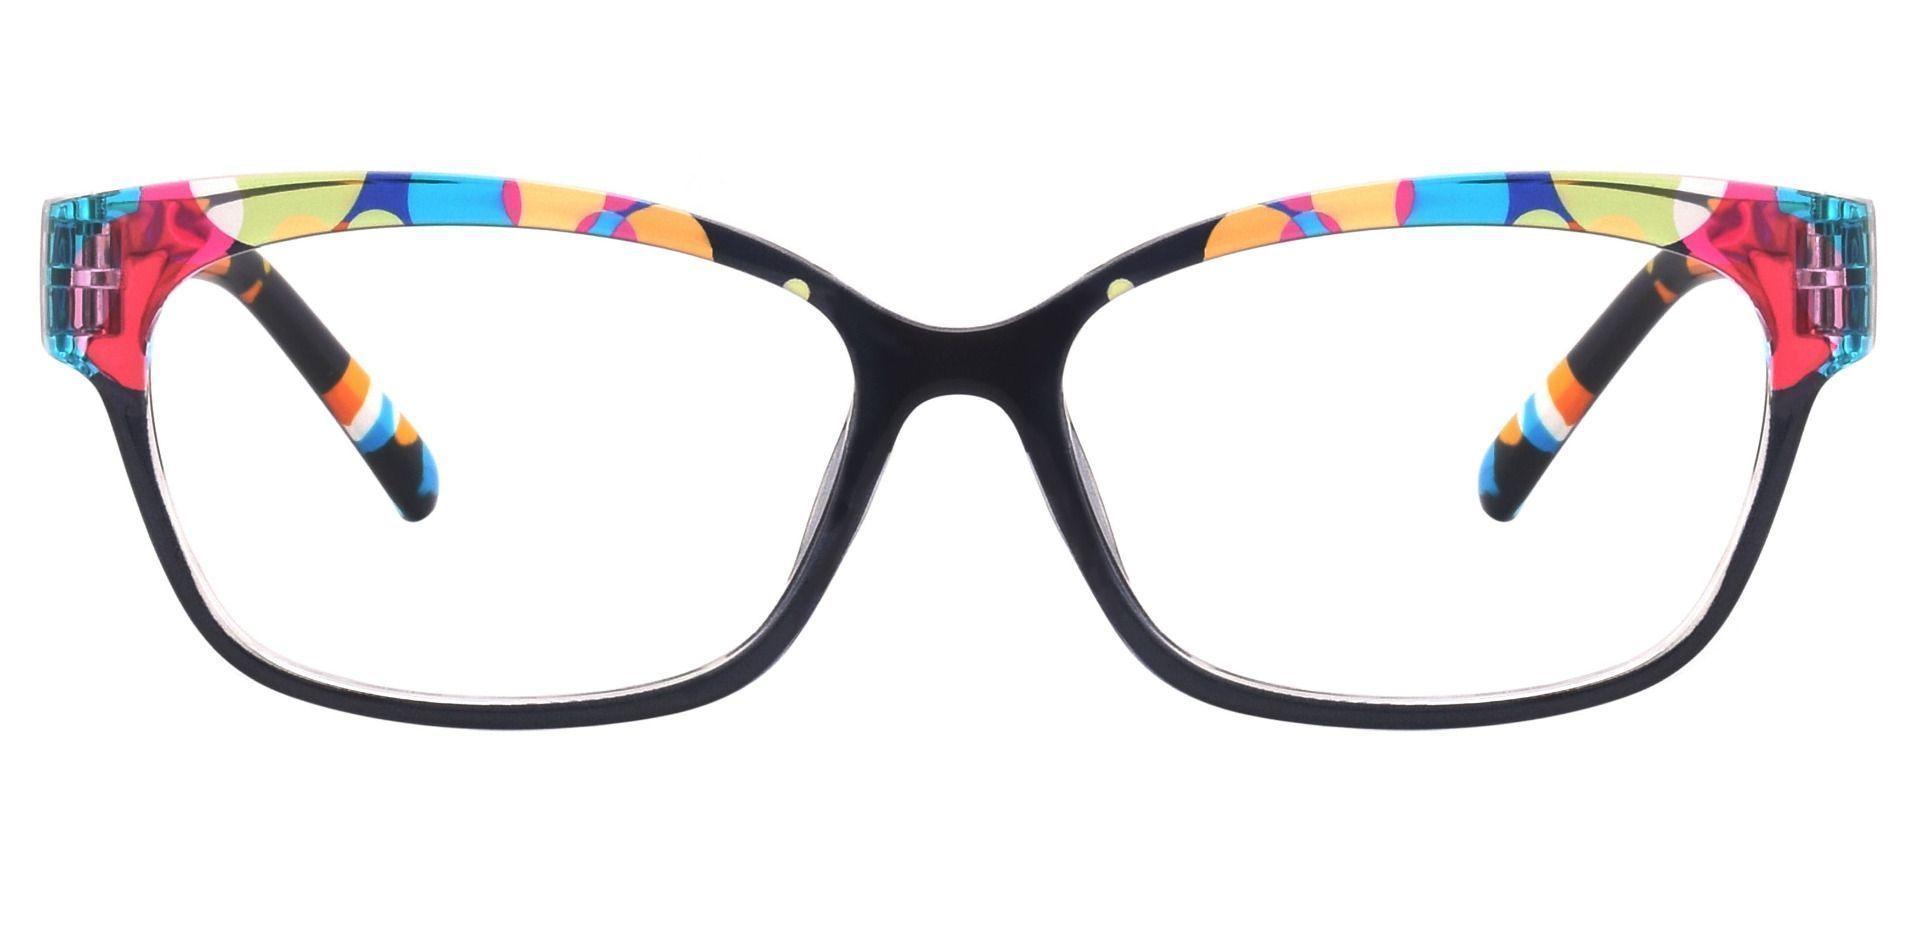 Adele Cat-Eye Prescription Glasses - Two